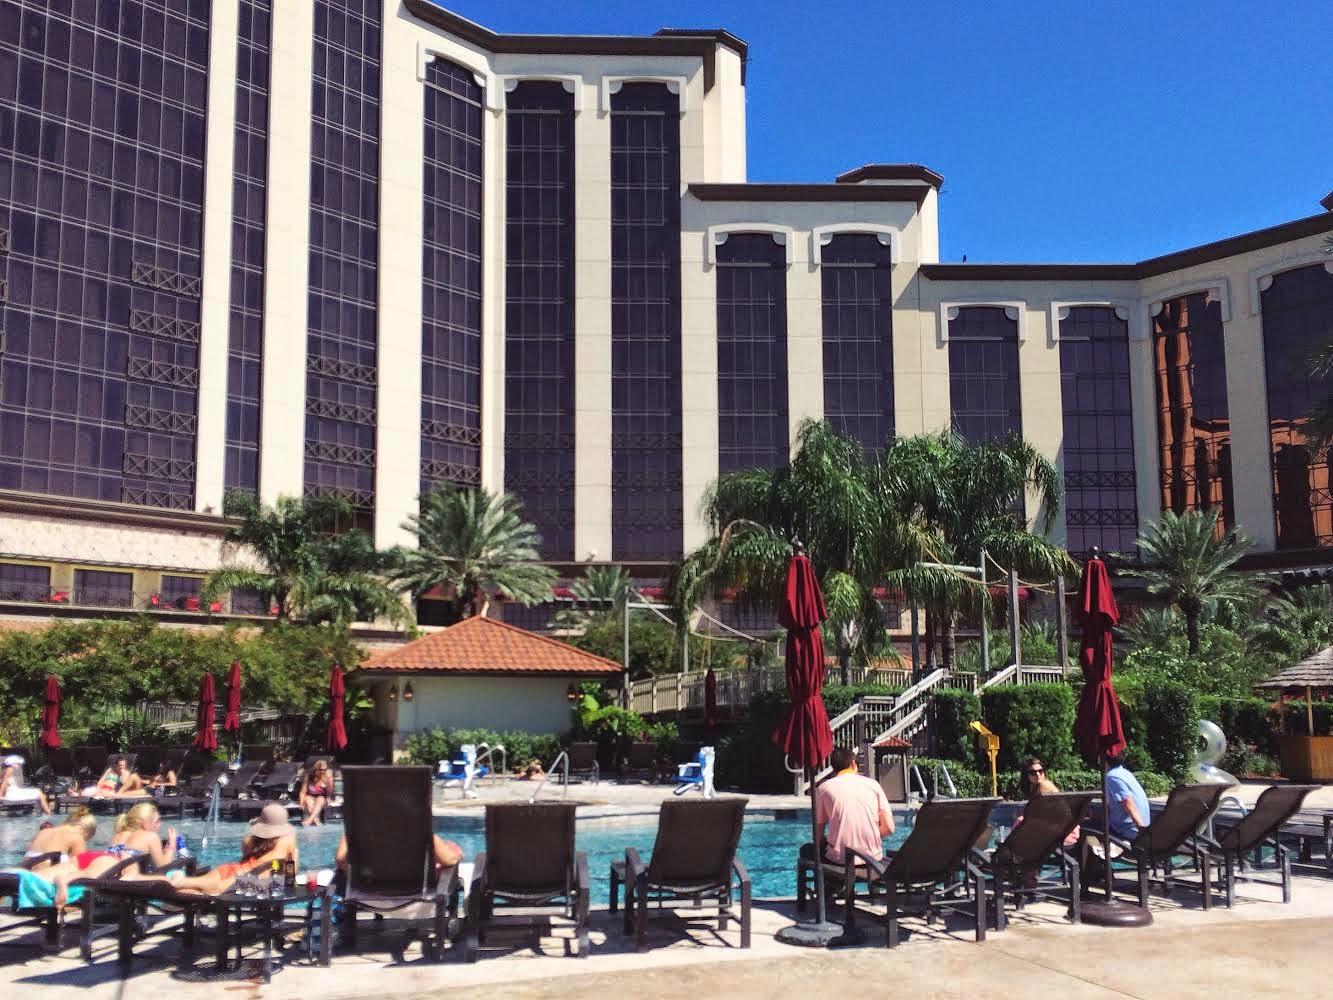 L'Auberge Lake Charles Casino Resort, LAuberge Lake Charles, Lake Charles Casino, L'Auberge, L'Auberge Casino, L'Auberge Pool, L'Auberge Lazy River,